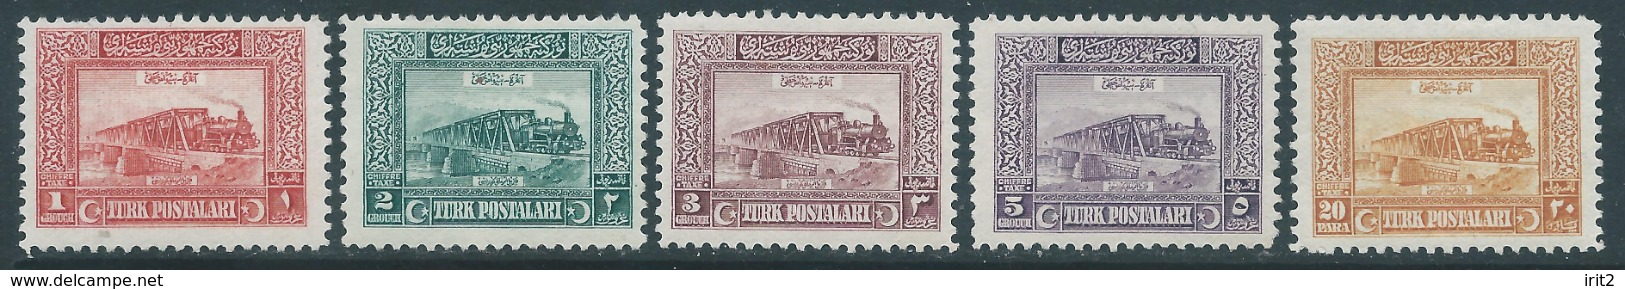 Turchia Turkey Republic 1926 Written In Arabic And Latin,original Gum,High Value, Rare - Unused Stamps